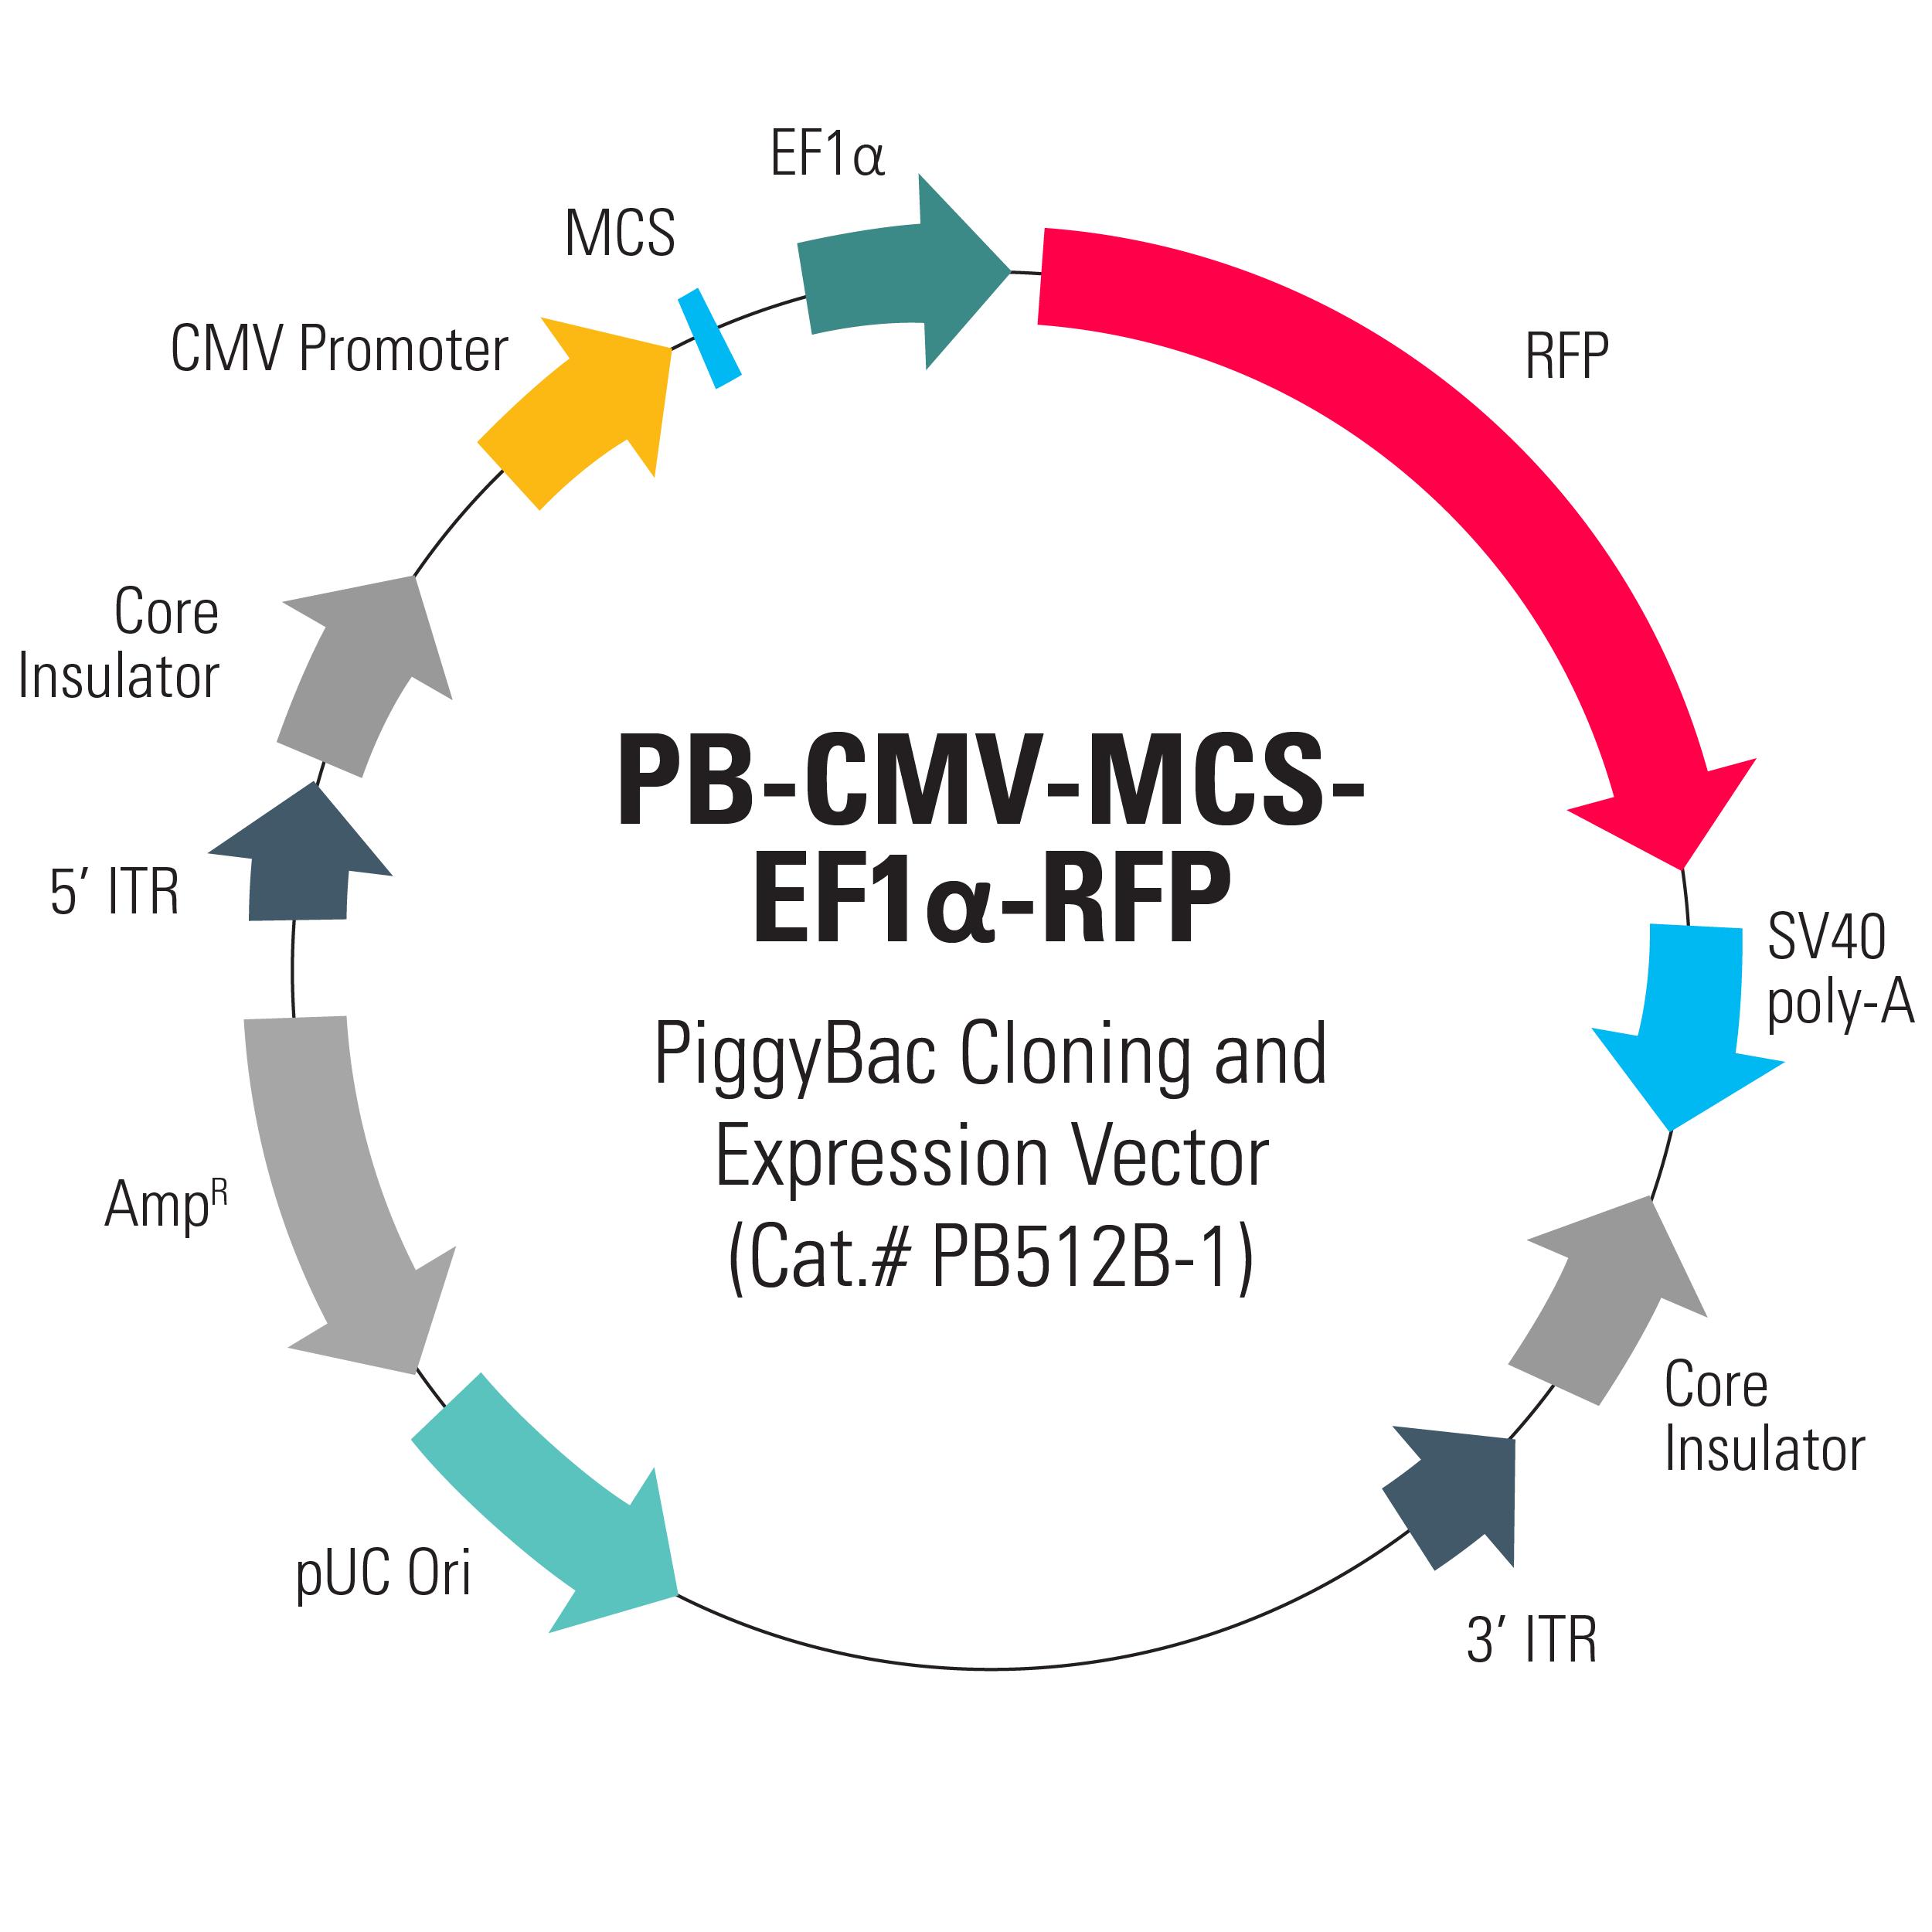 2500x2500 Pb Cmv Mcs Rfp Cdna Cloning And Expression Vector System